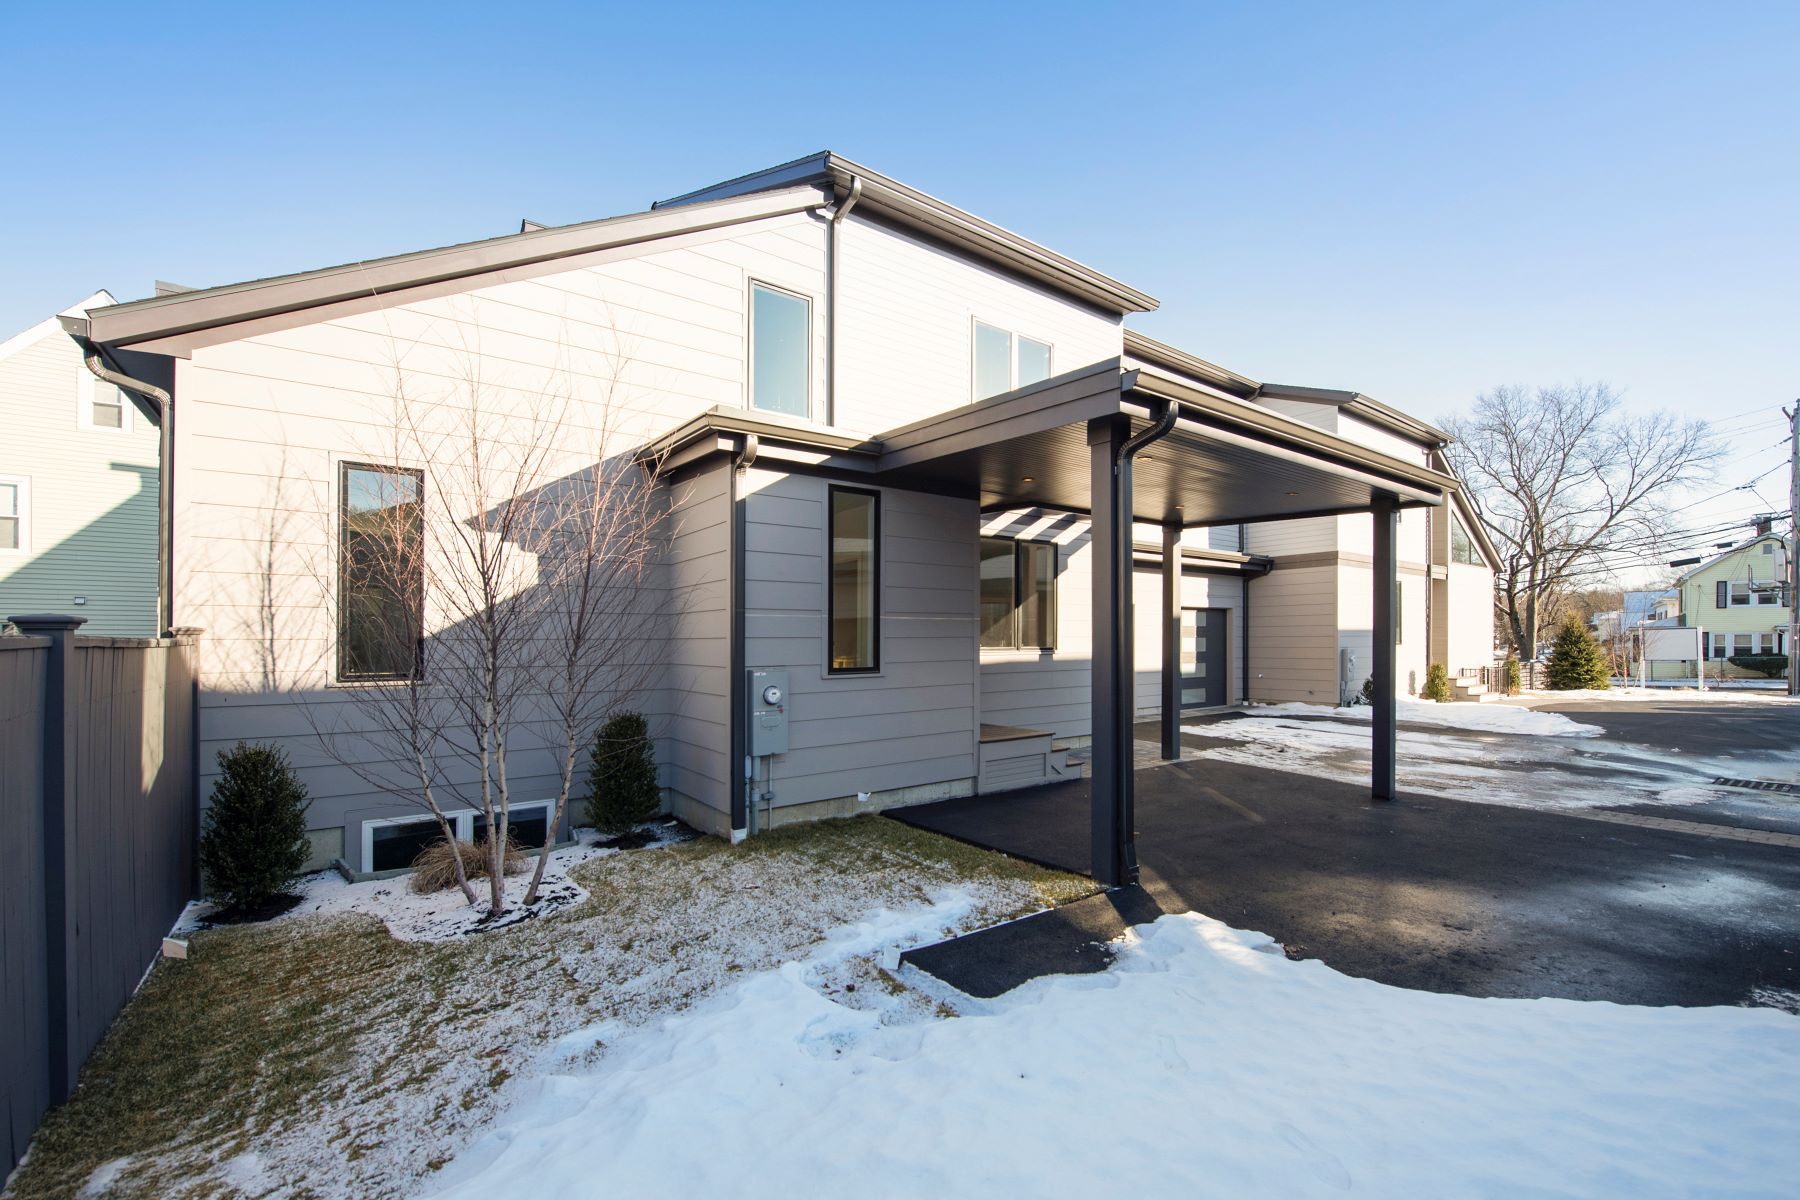 Single Family Home for Active at 25 Auburndale Ave Newton, Massachusetts 02465 United States